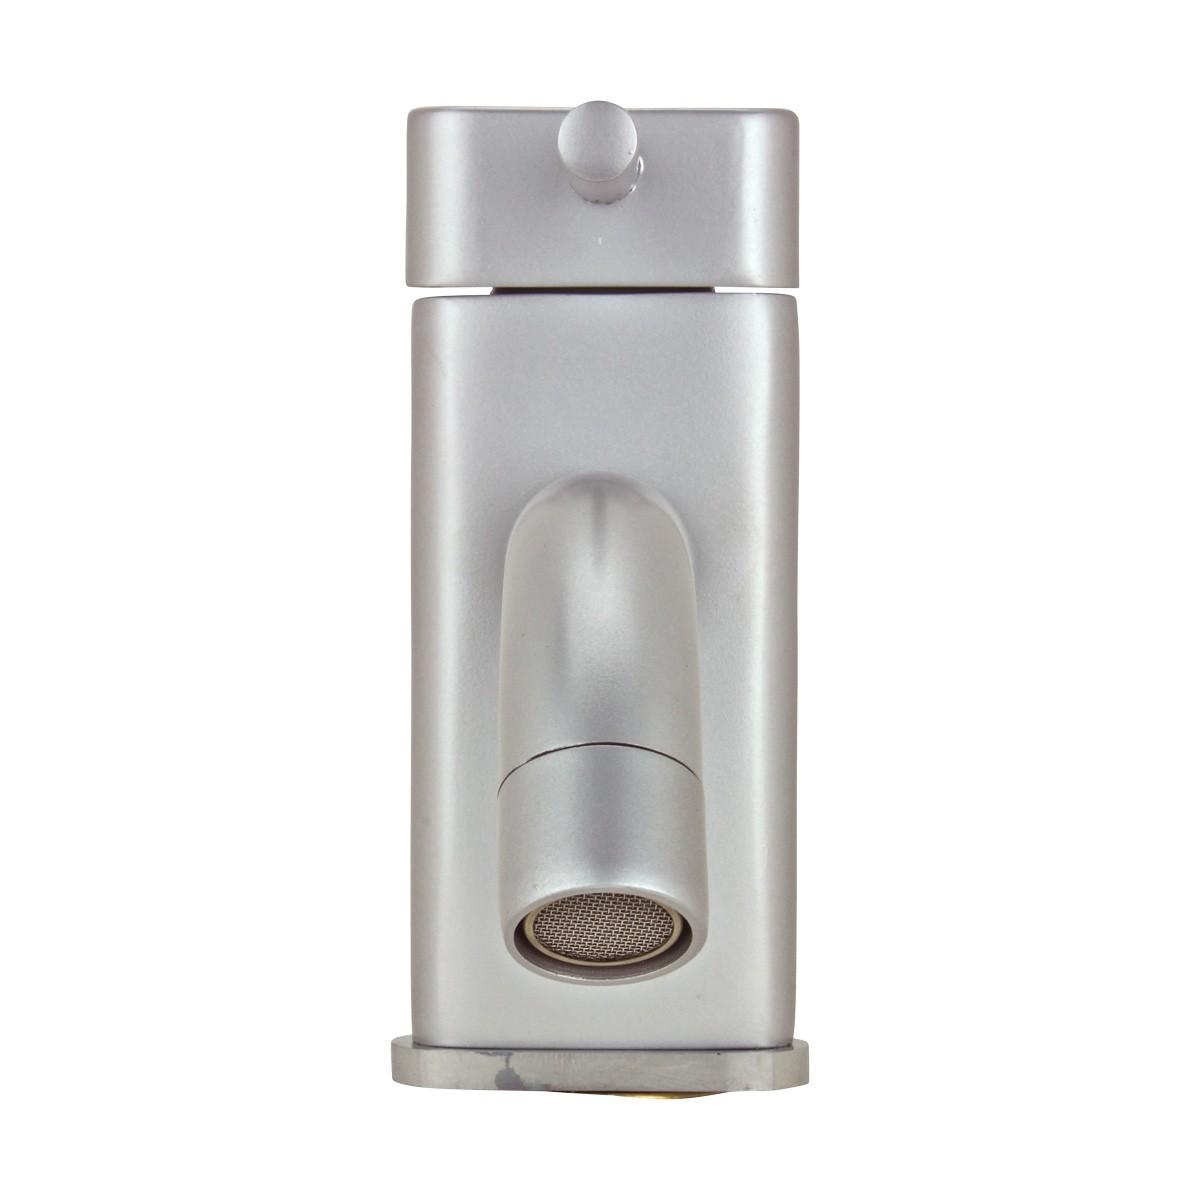 Bathroom Faucet Satin Nickel Triangular Single Hole 1 Handle Satin Faucets Single Hole Bathroom Faucets Single Hole Faucet